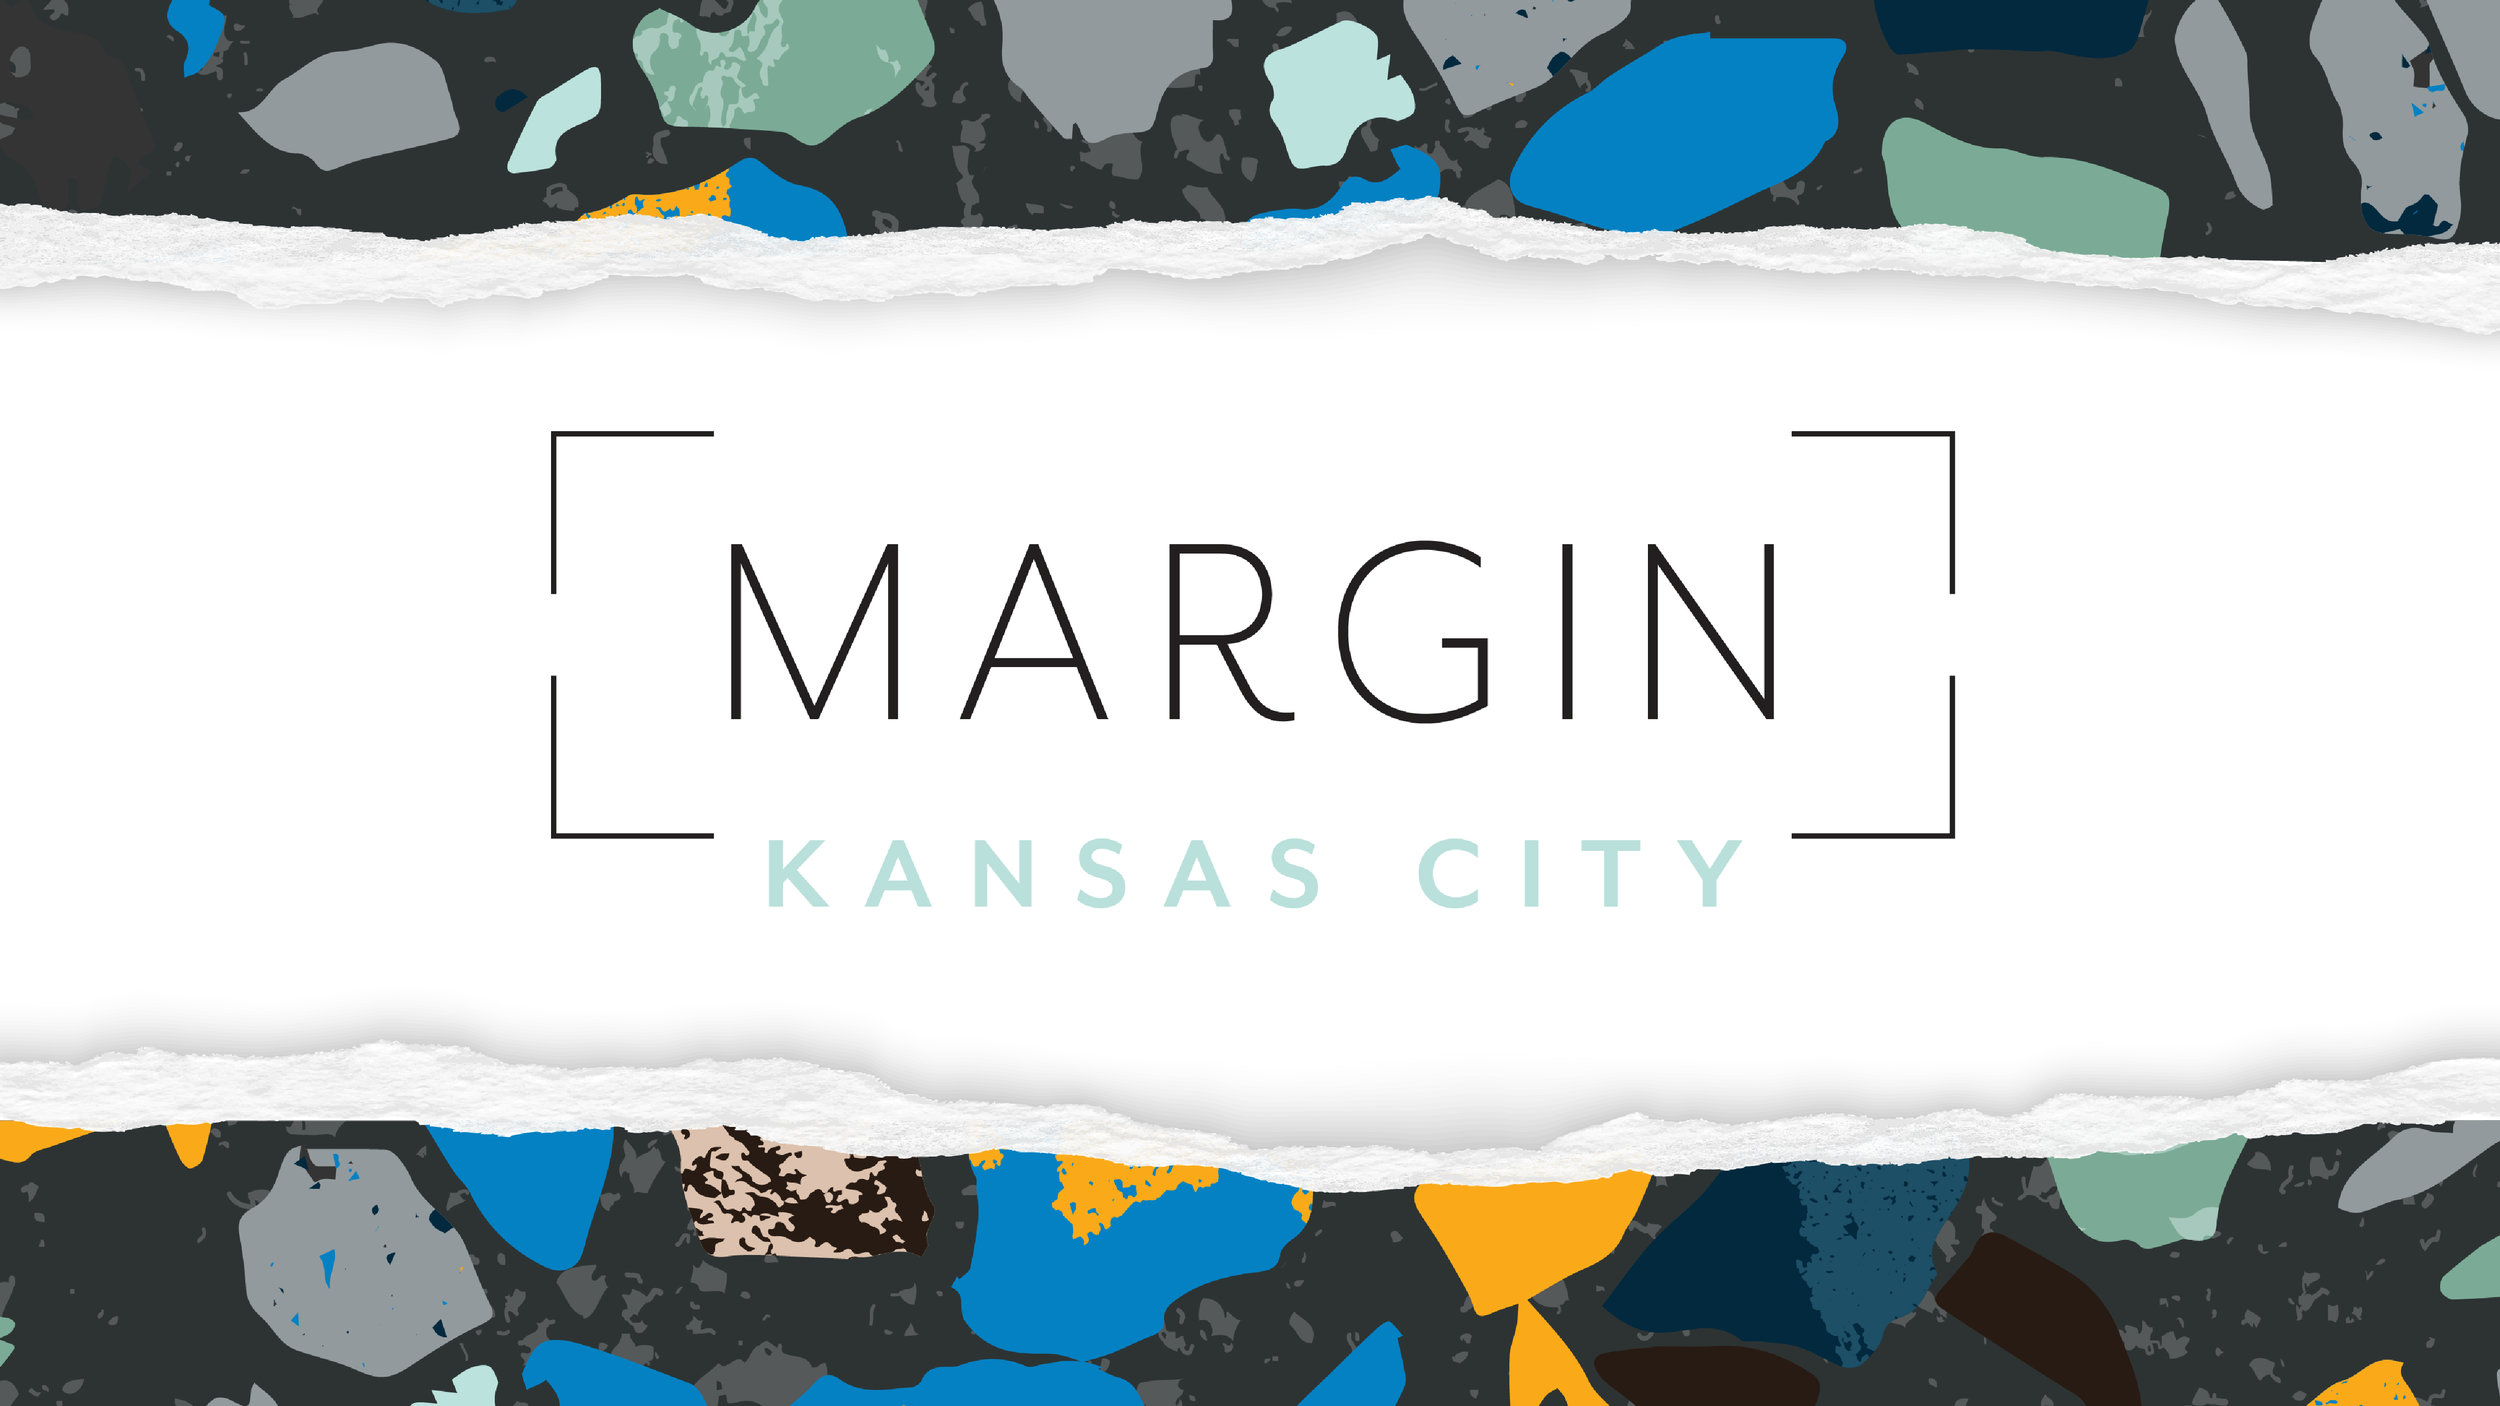 marginmaingraphic-01.jpg